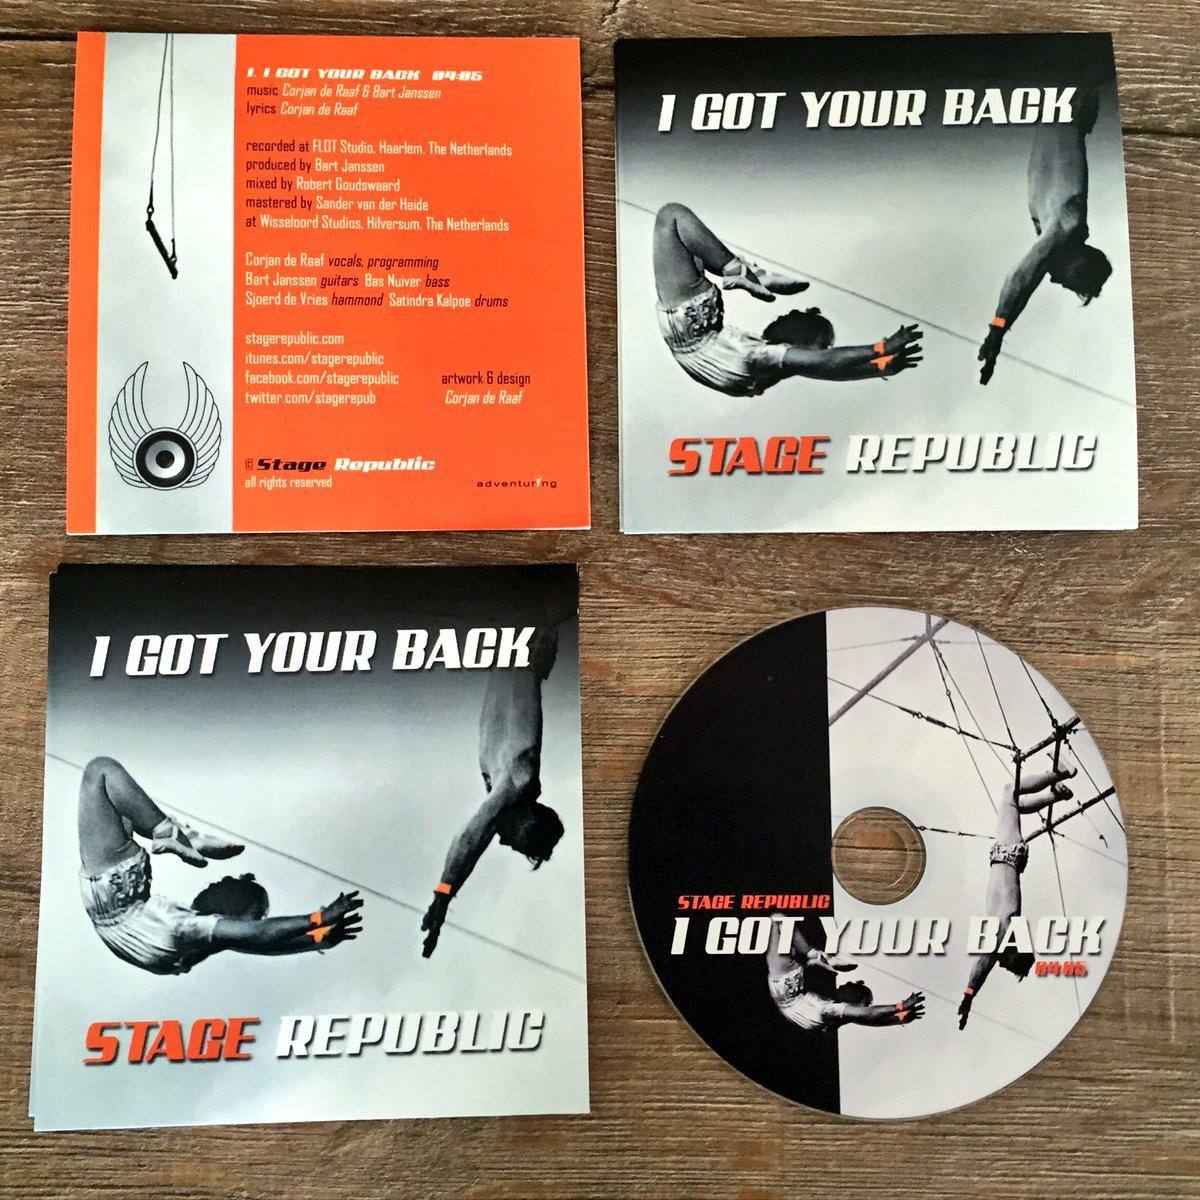 I Got Your Promo CD's. How undigital #newmusic #indie https://t.co/ERueqa3nkL